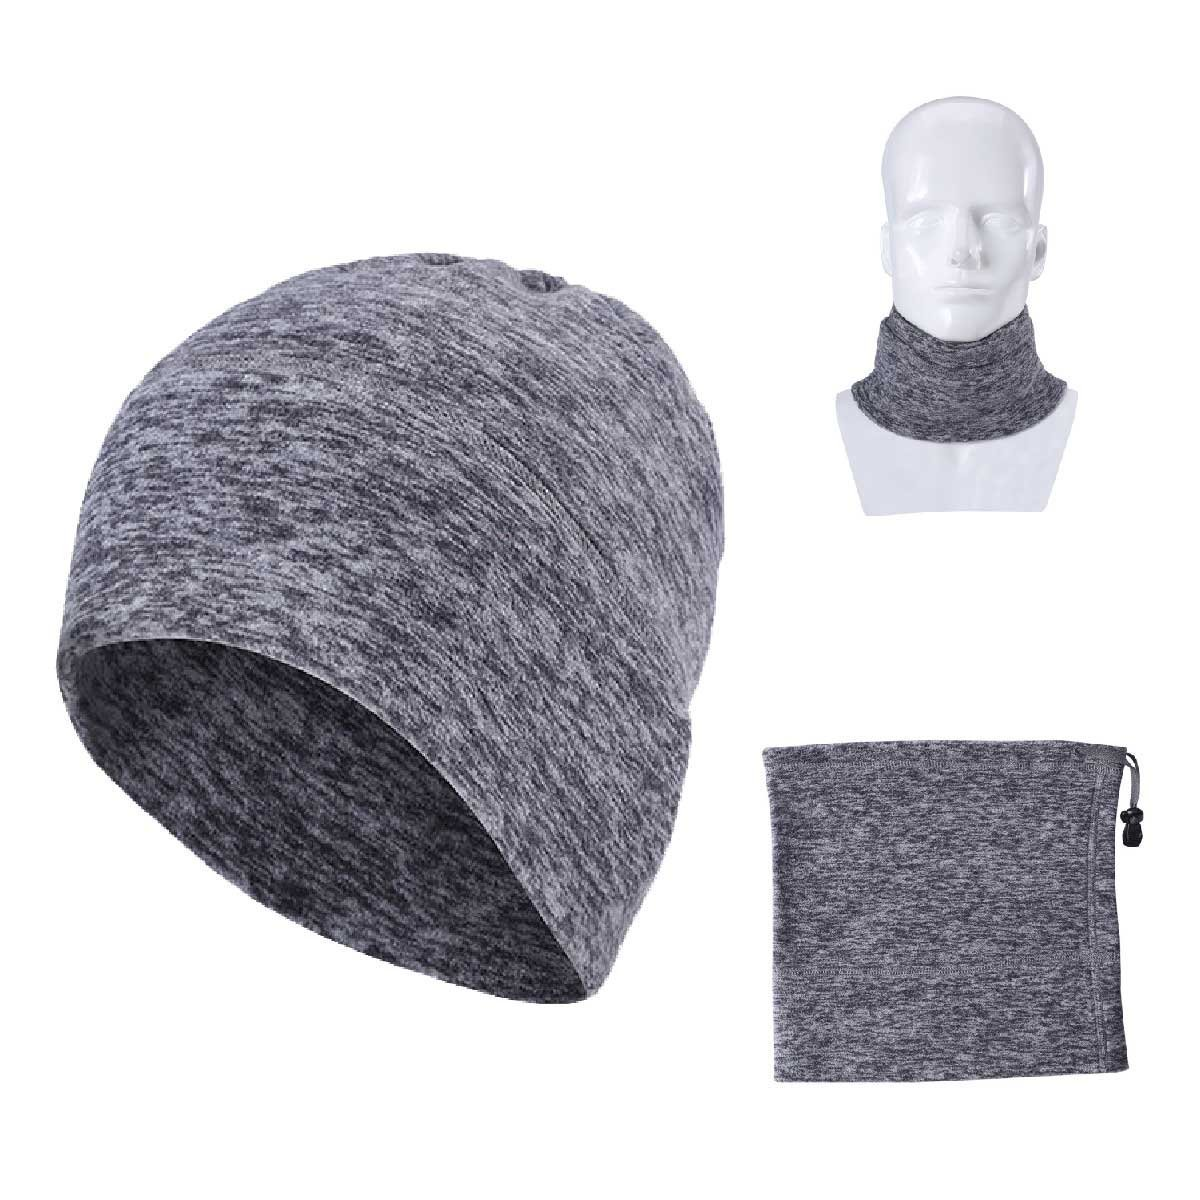 TRIWONDER Neck Warmer, Outdoor Multifunctional Headwear - Magic Scarf, Face Mask, Do Rag, Winter Cap (Grey - 2)